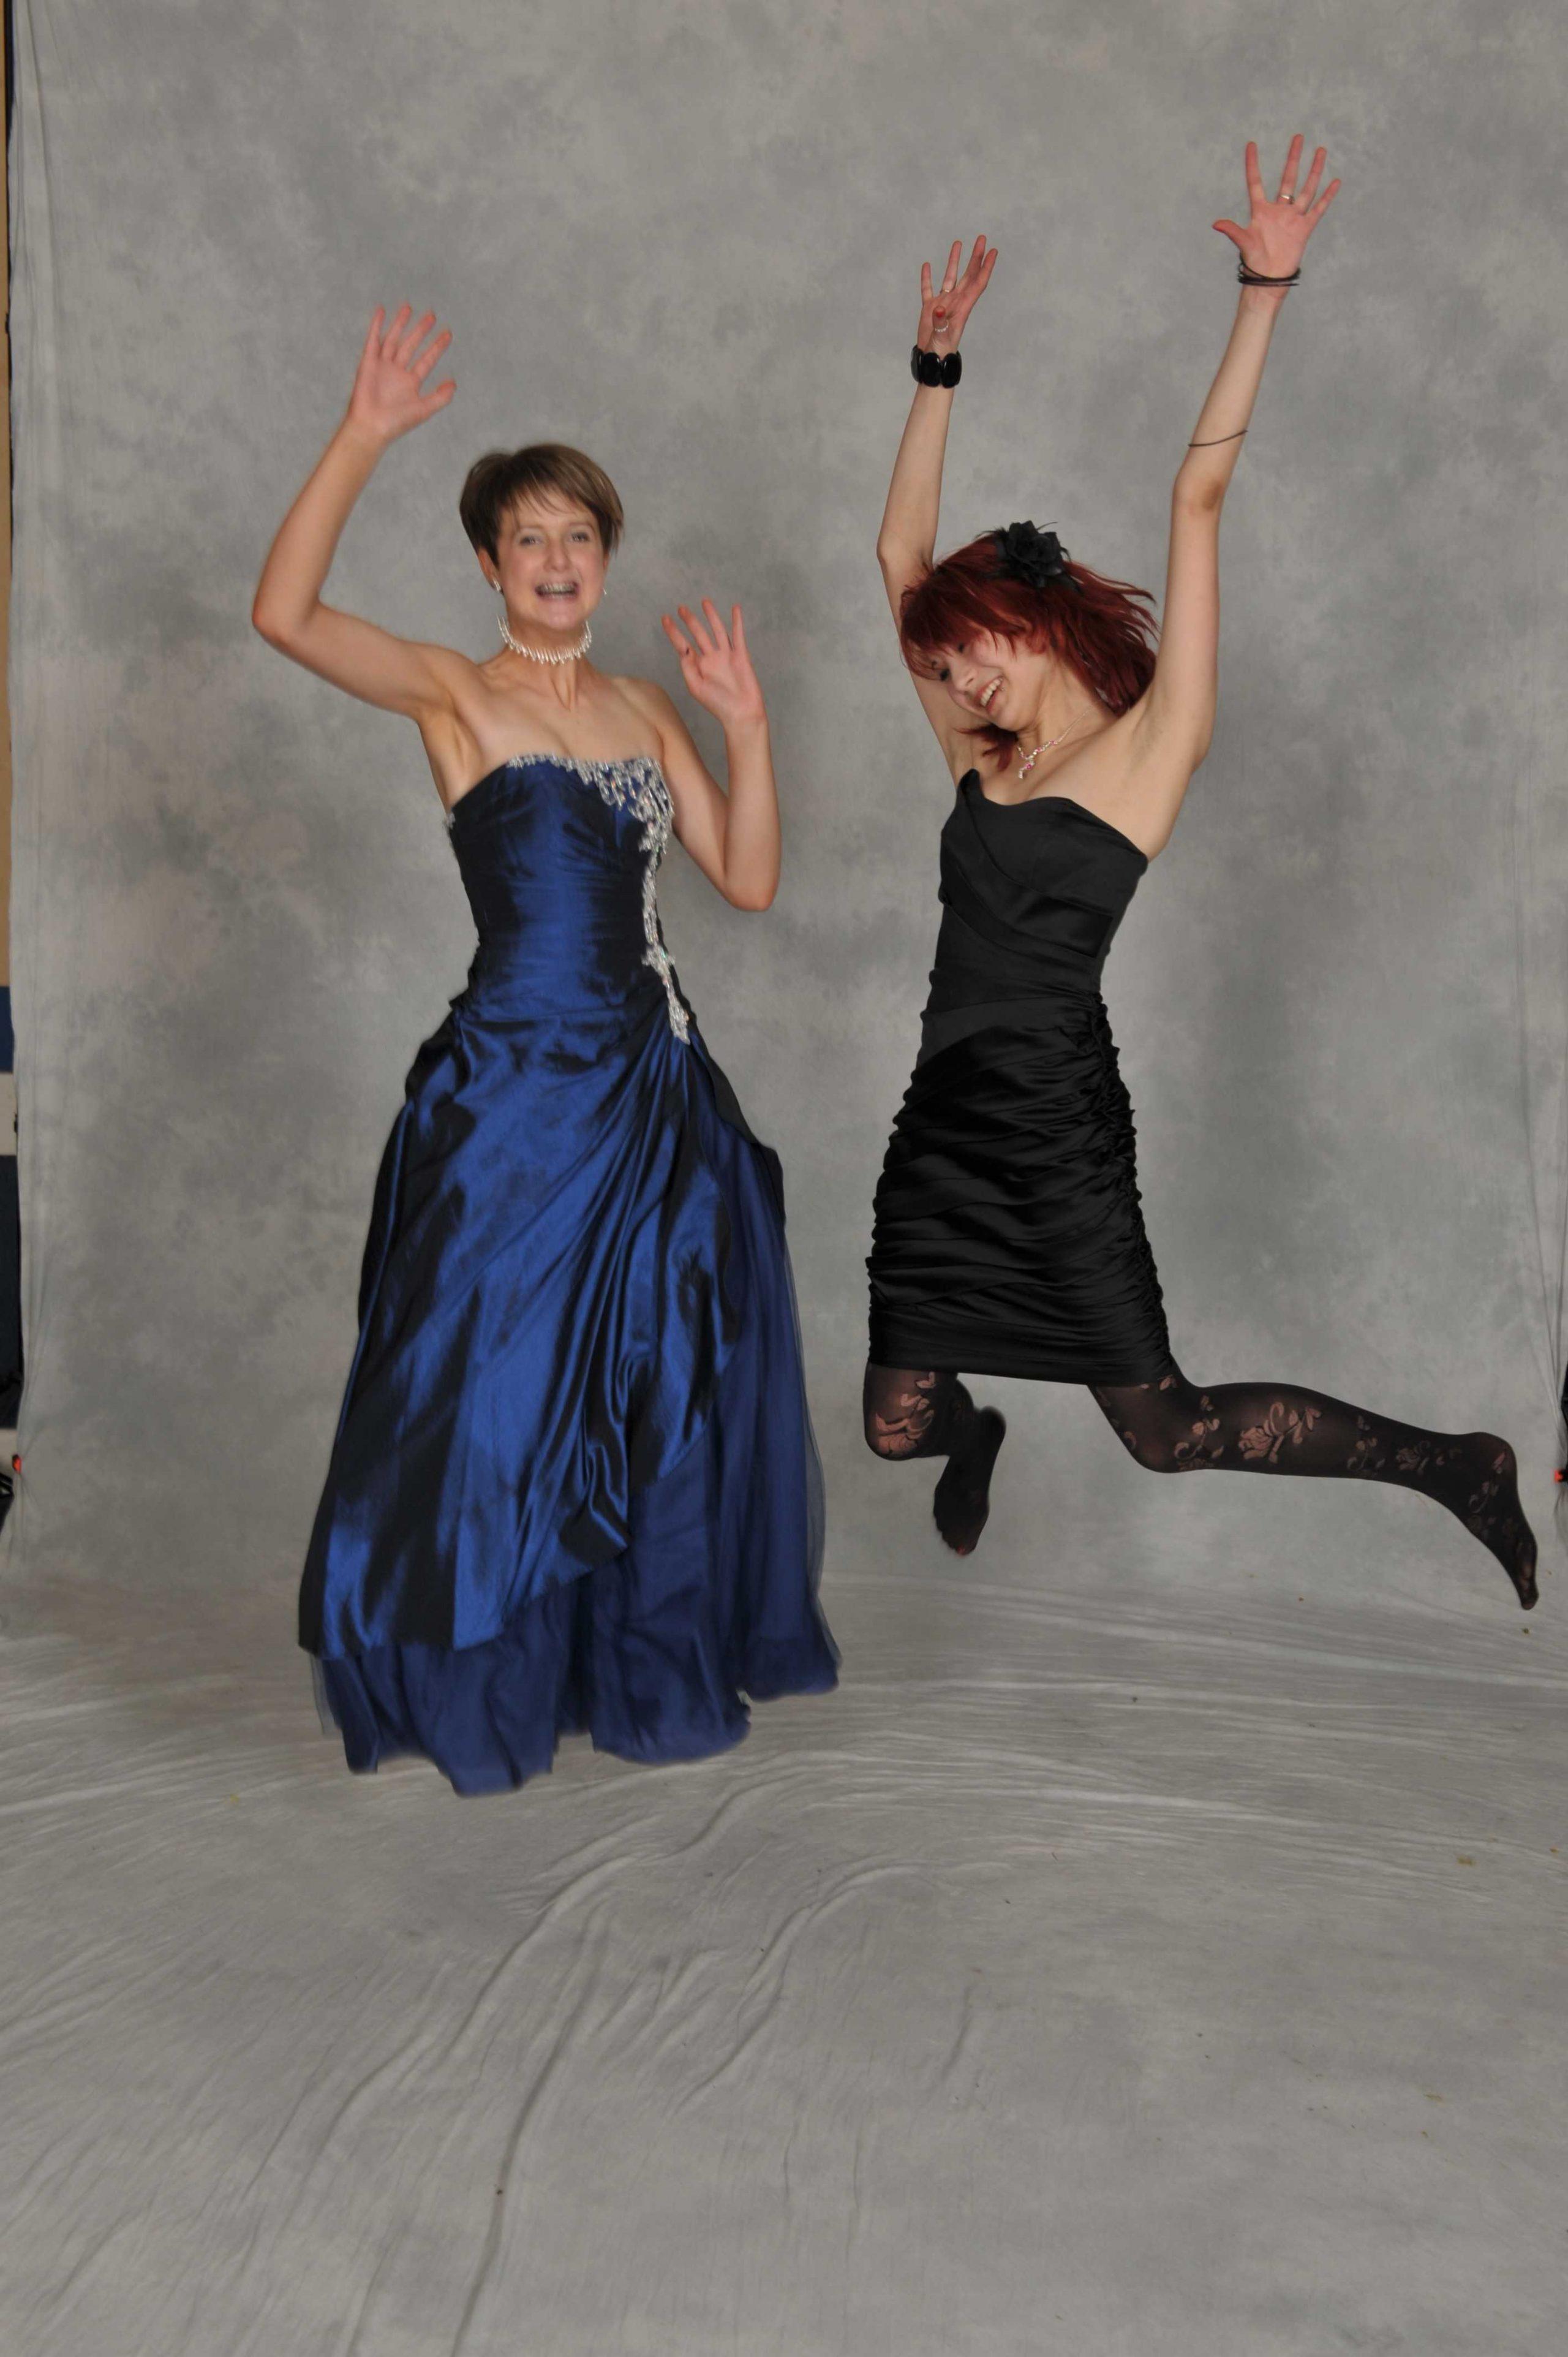 BSG (Bournemouth School for Girls) Prom 2011